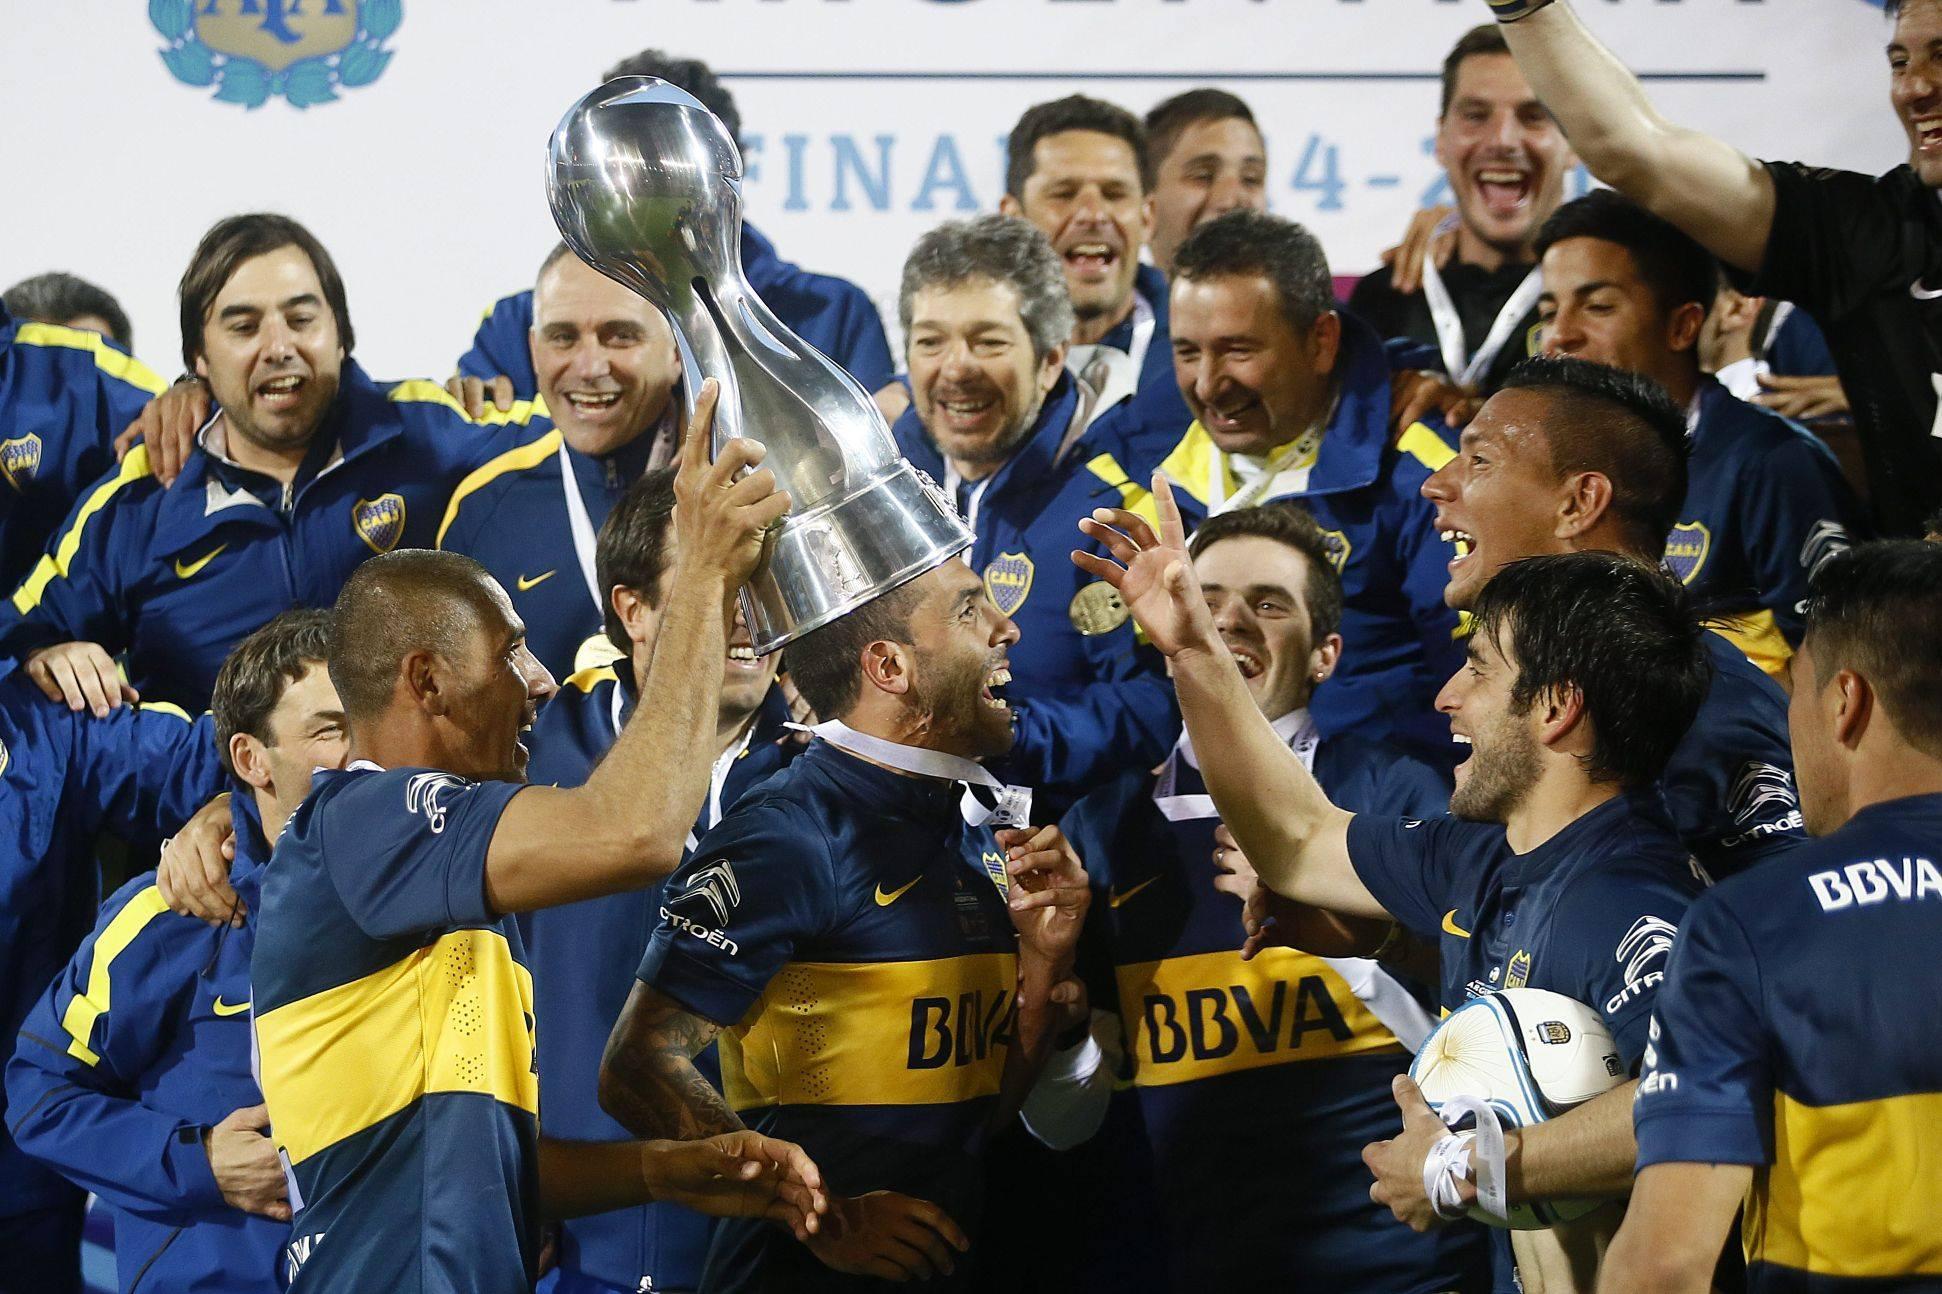 Boca Juniors Copa Argentina 2015